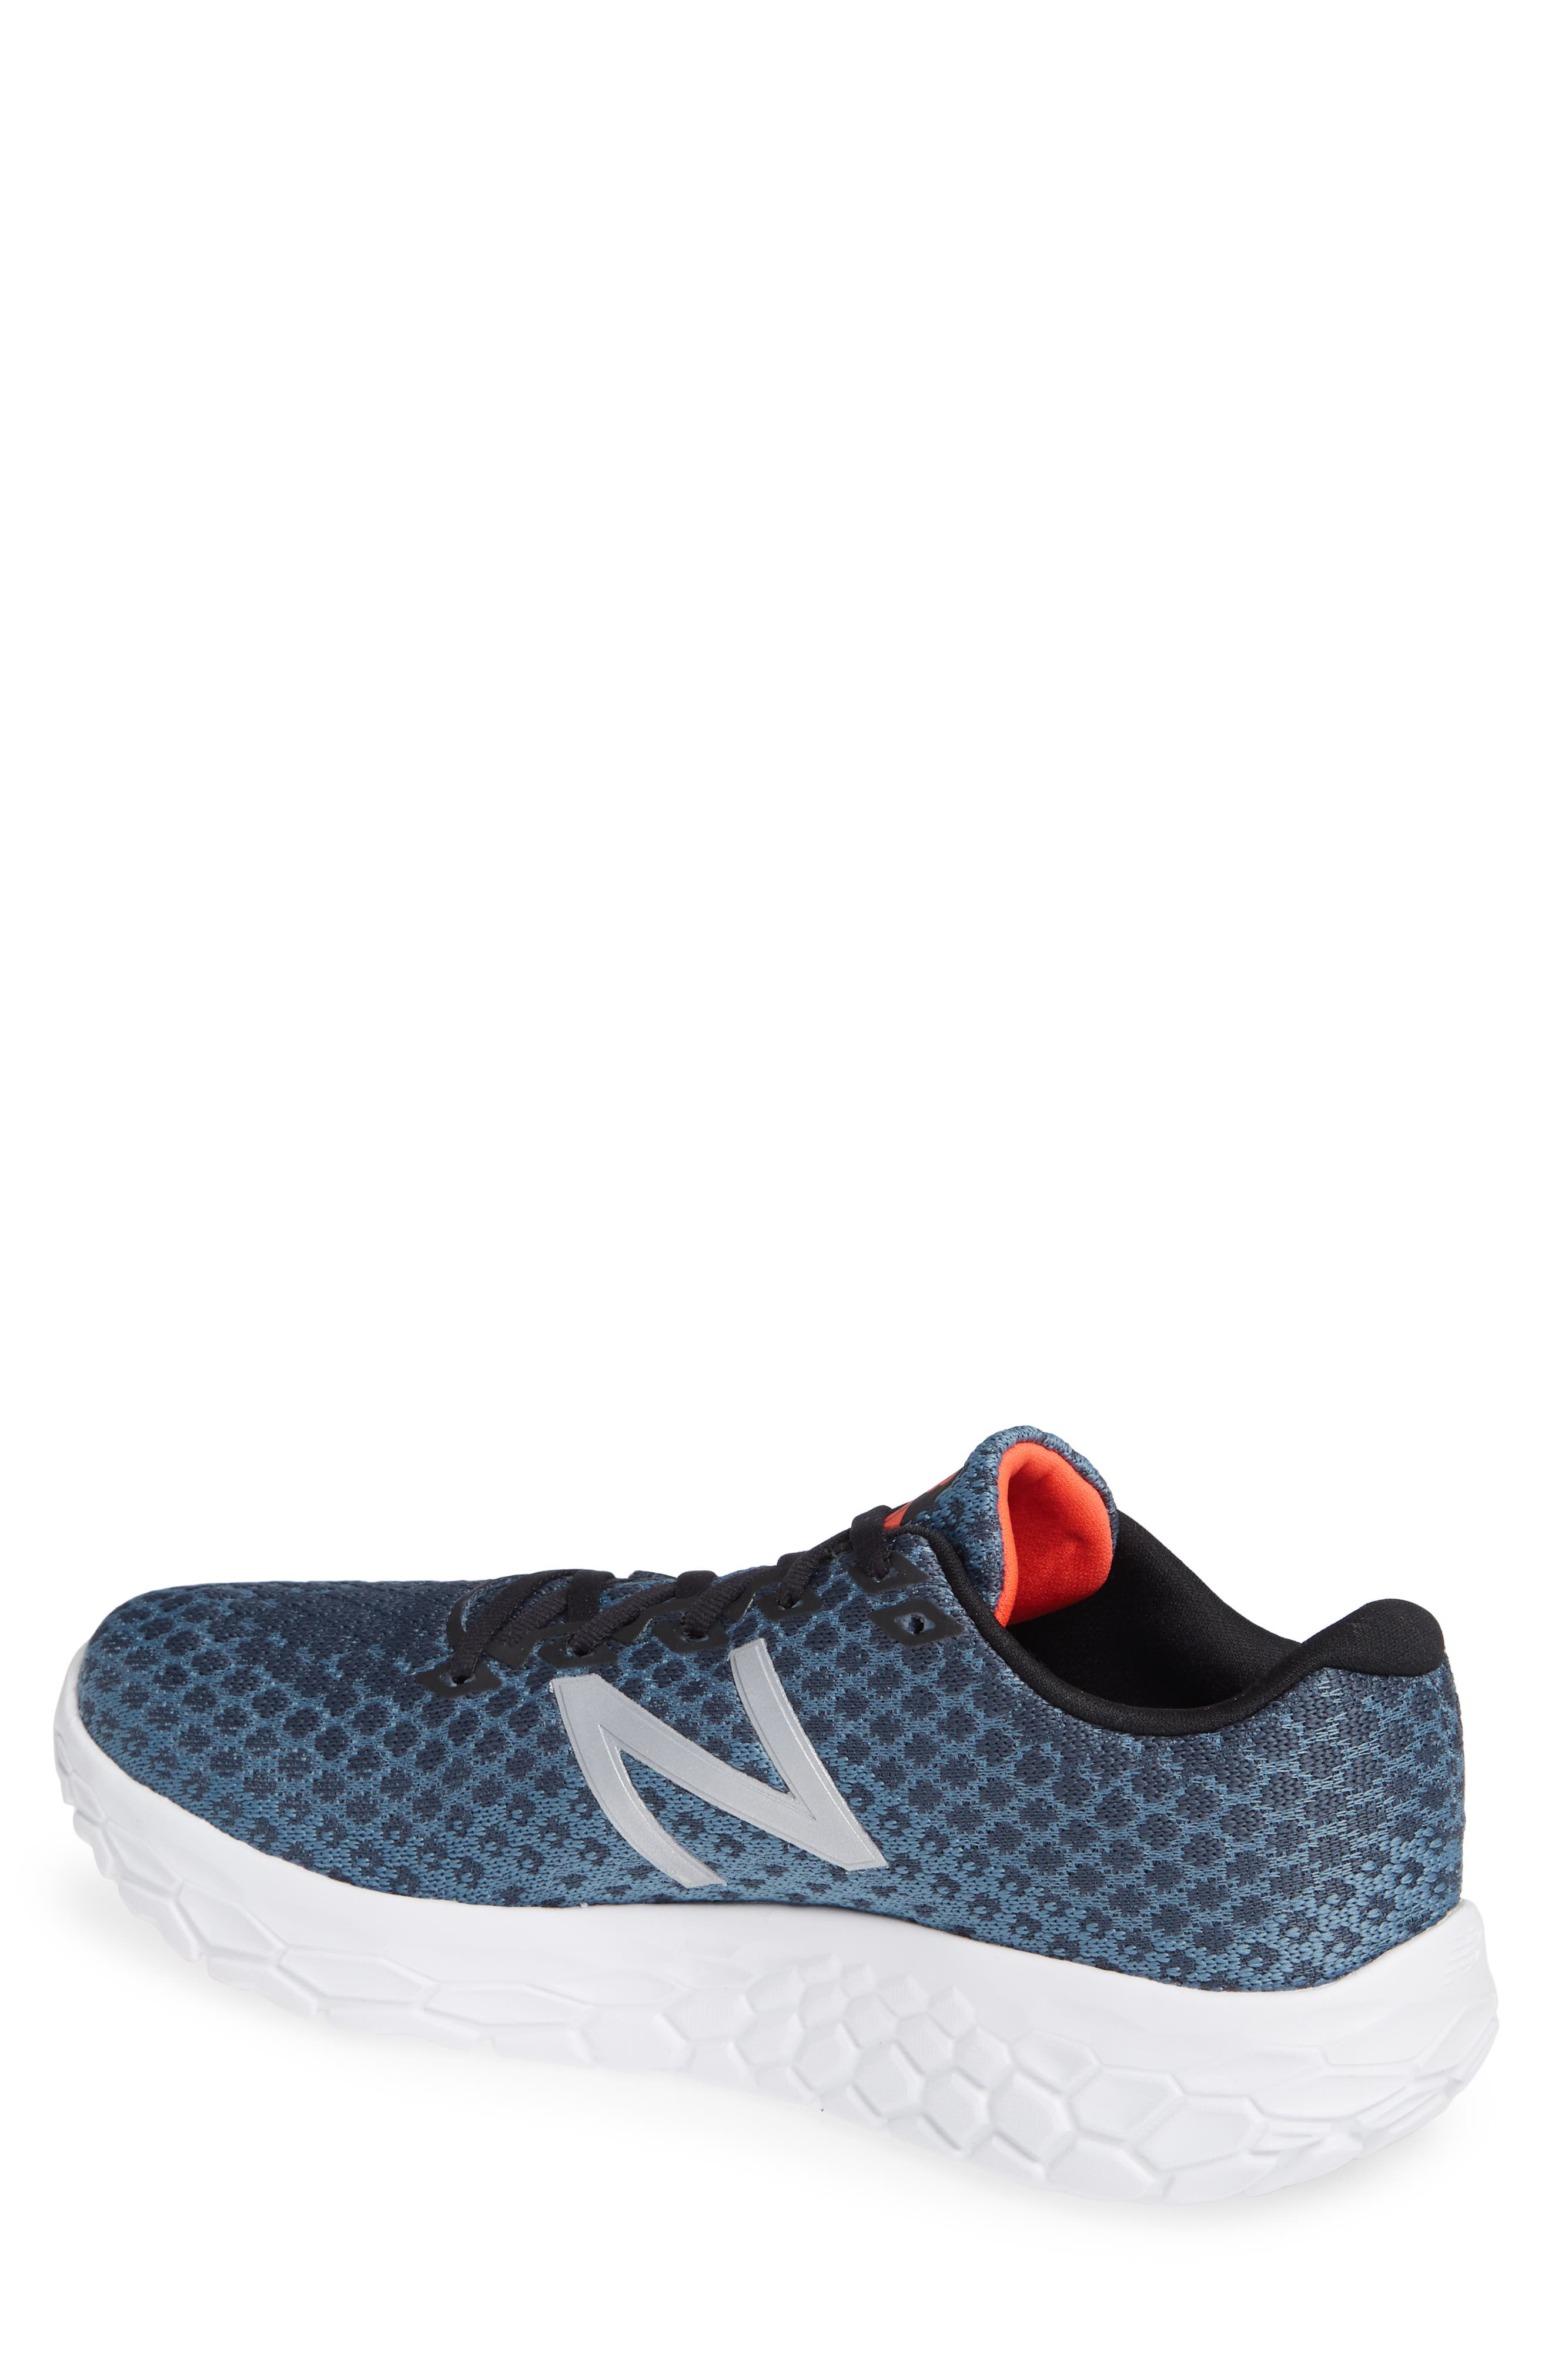 Fresh Foam Beacon Running Shoe,                             Alternate thumbnail 2, color,                             PETROL